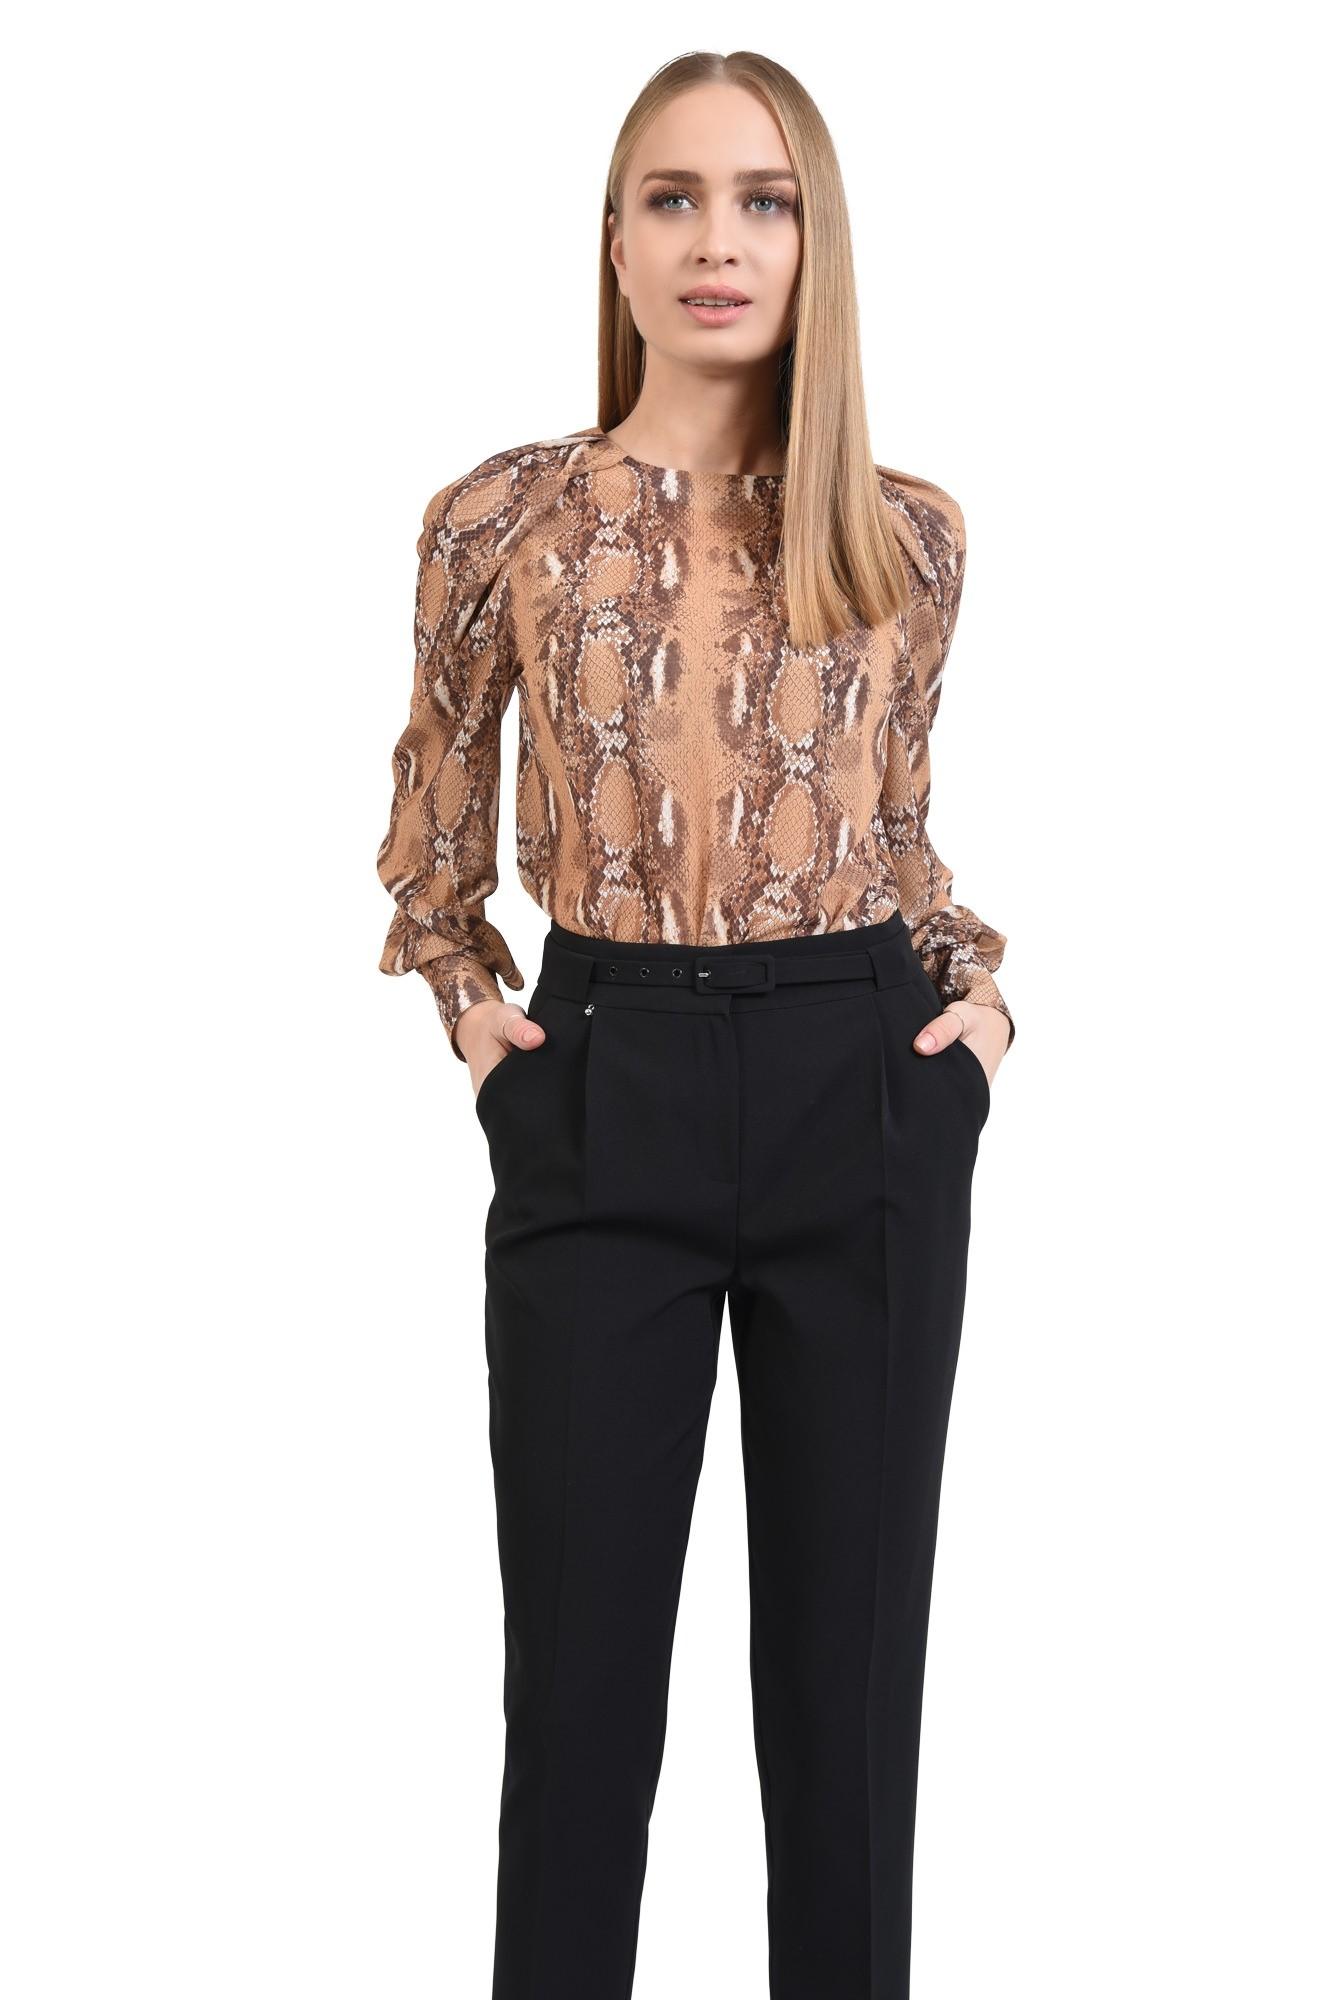 2 - pantaloni de zi, negri, office, de birou, centura ingusta